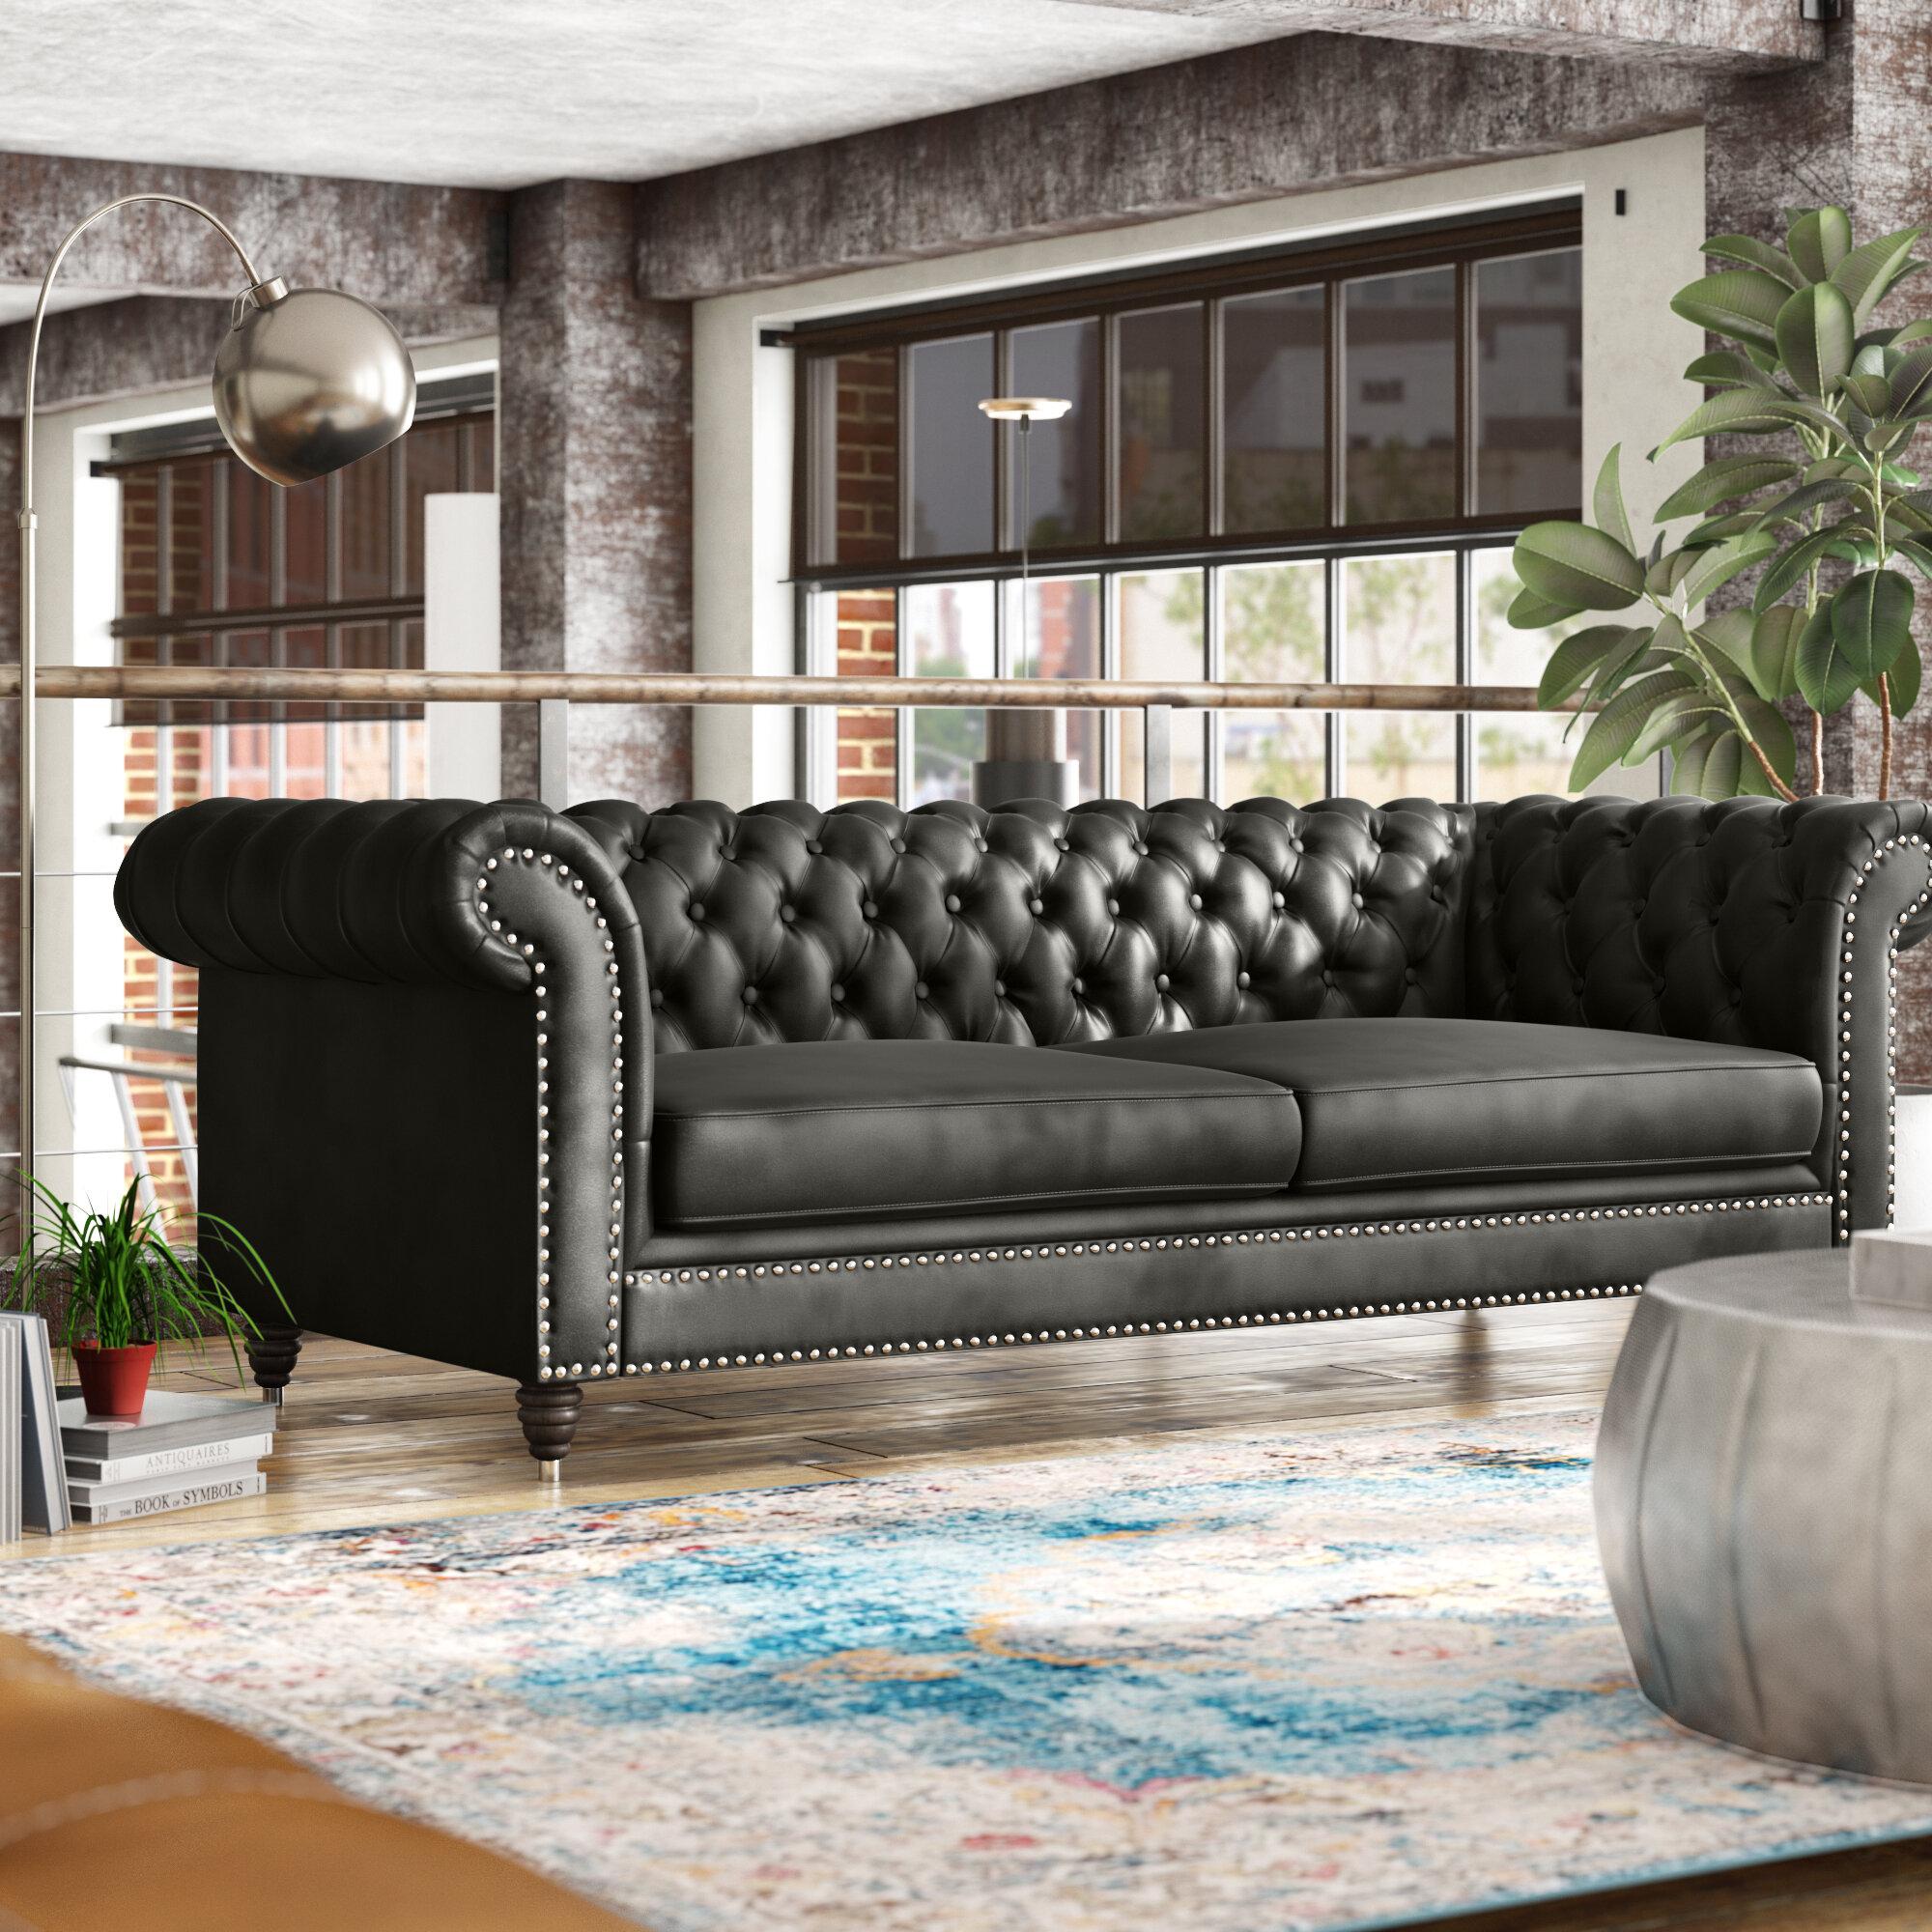 Design Alsager Chesterfield Sofa